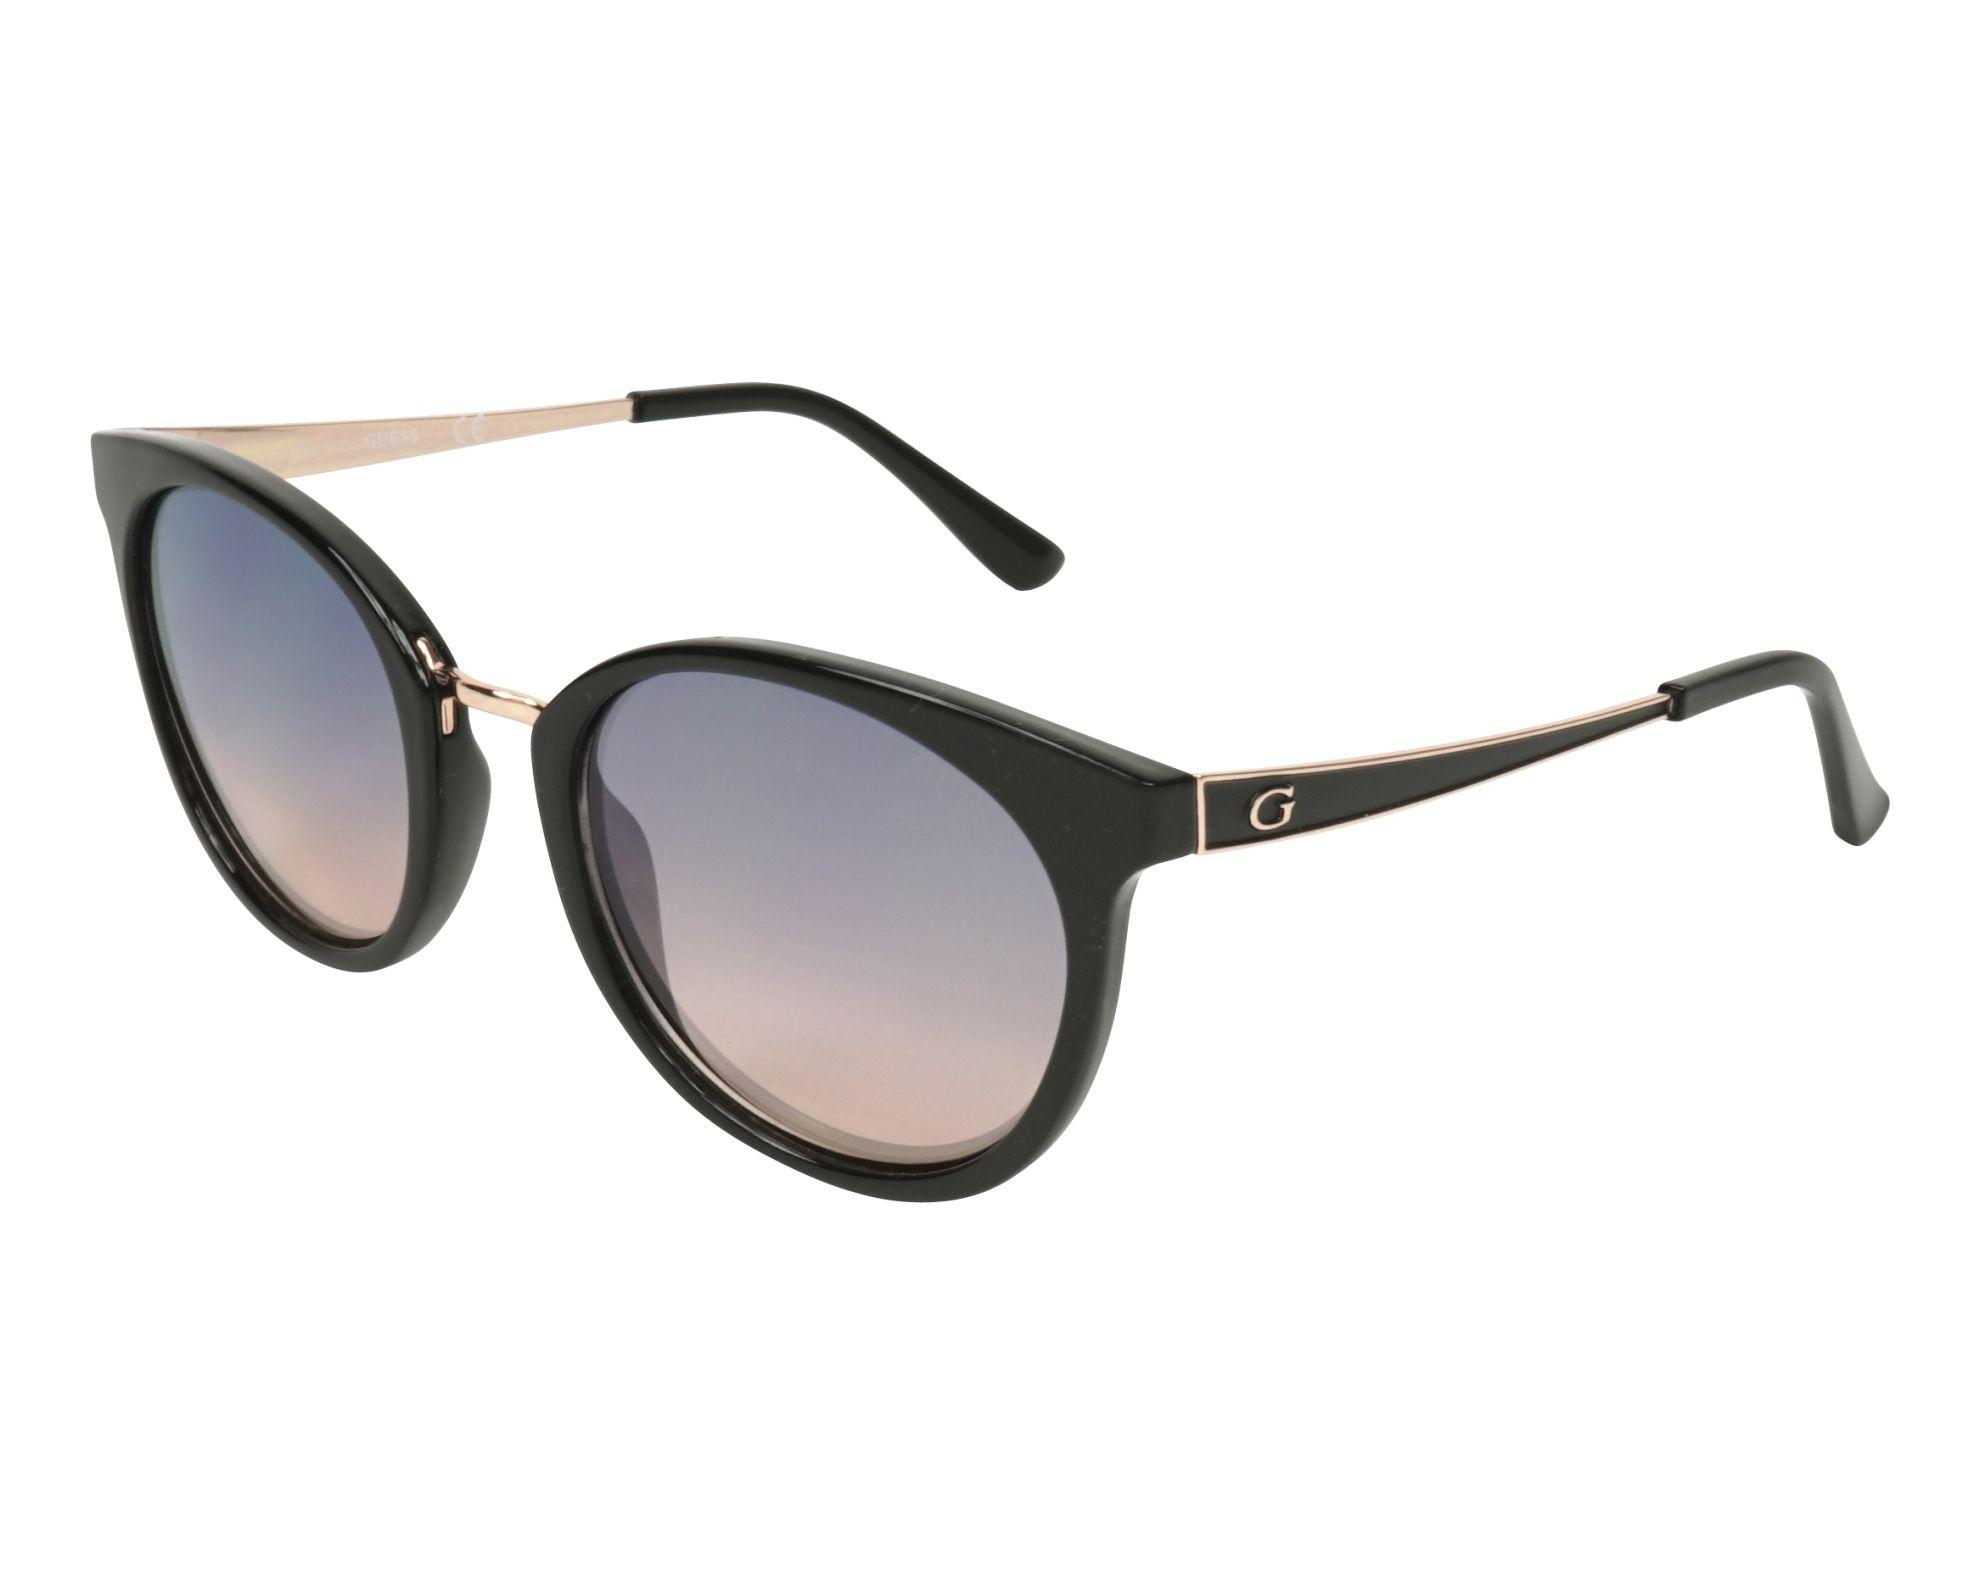 16330c23574 ... Sunglasses Guess GU-7459-S 05Z 52-20 Black Gold Copper profile view ...